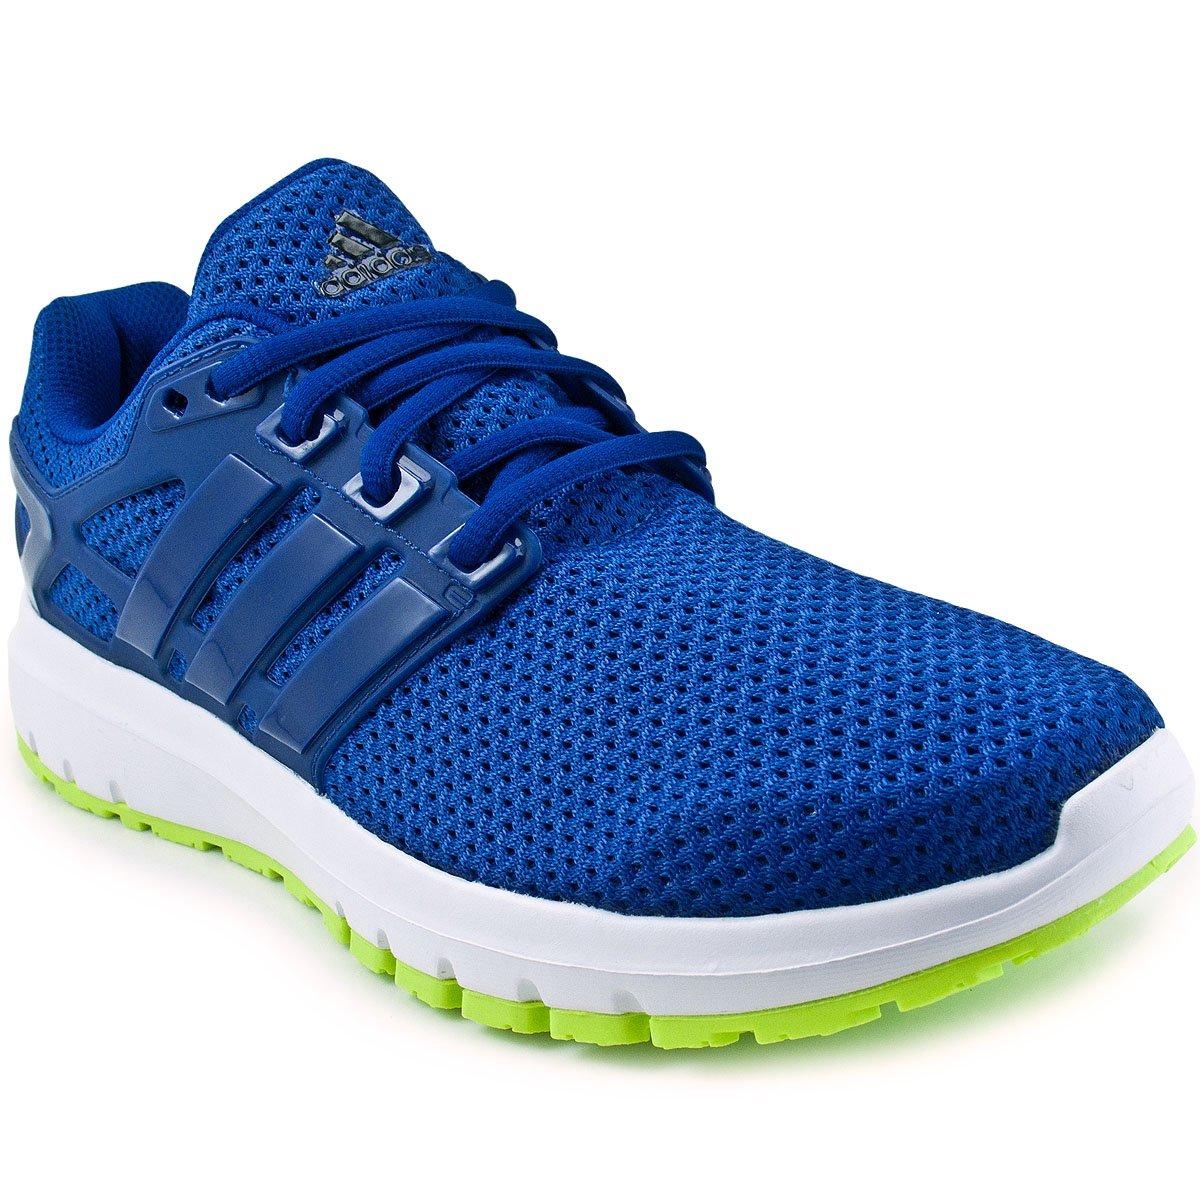 Tênis Adidas Energy Cloud Masculino  36c5cc0c2dbed